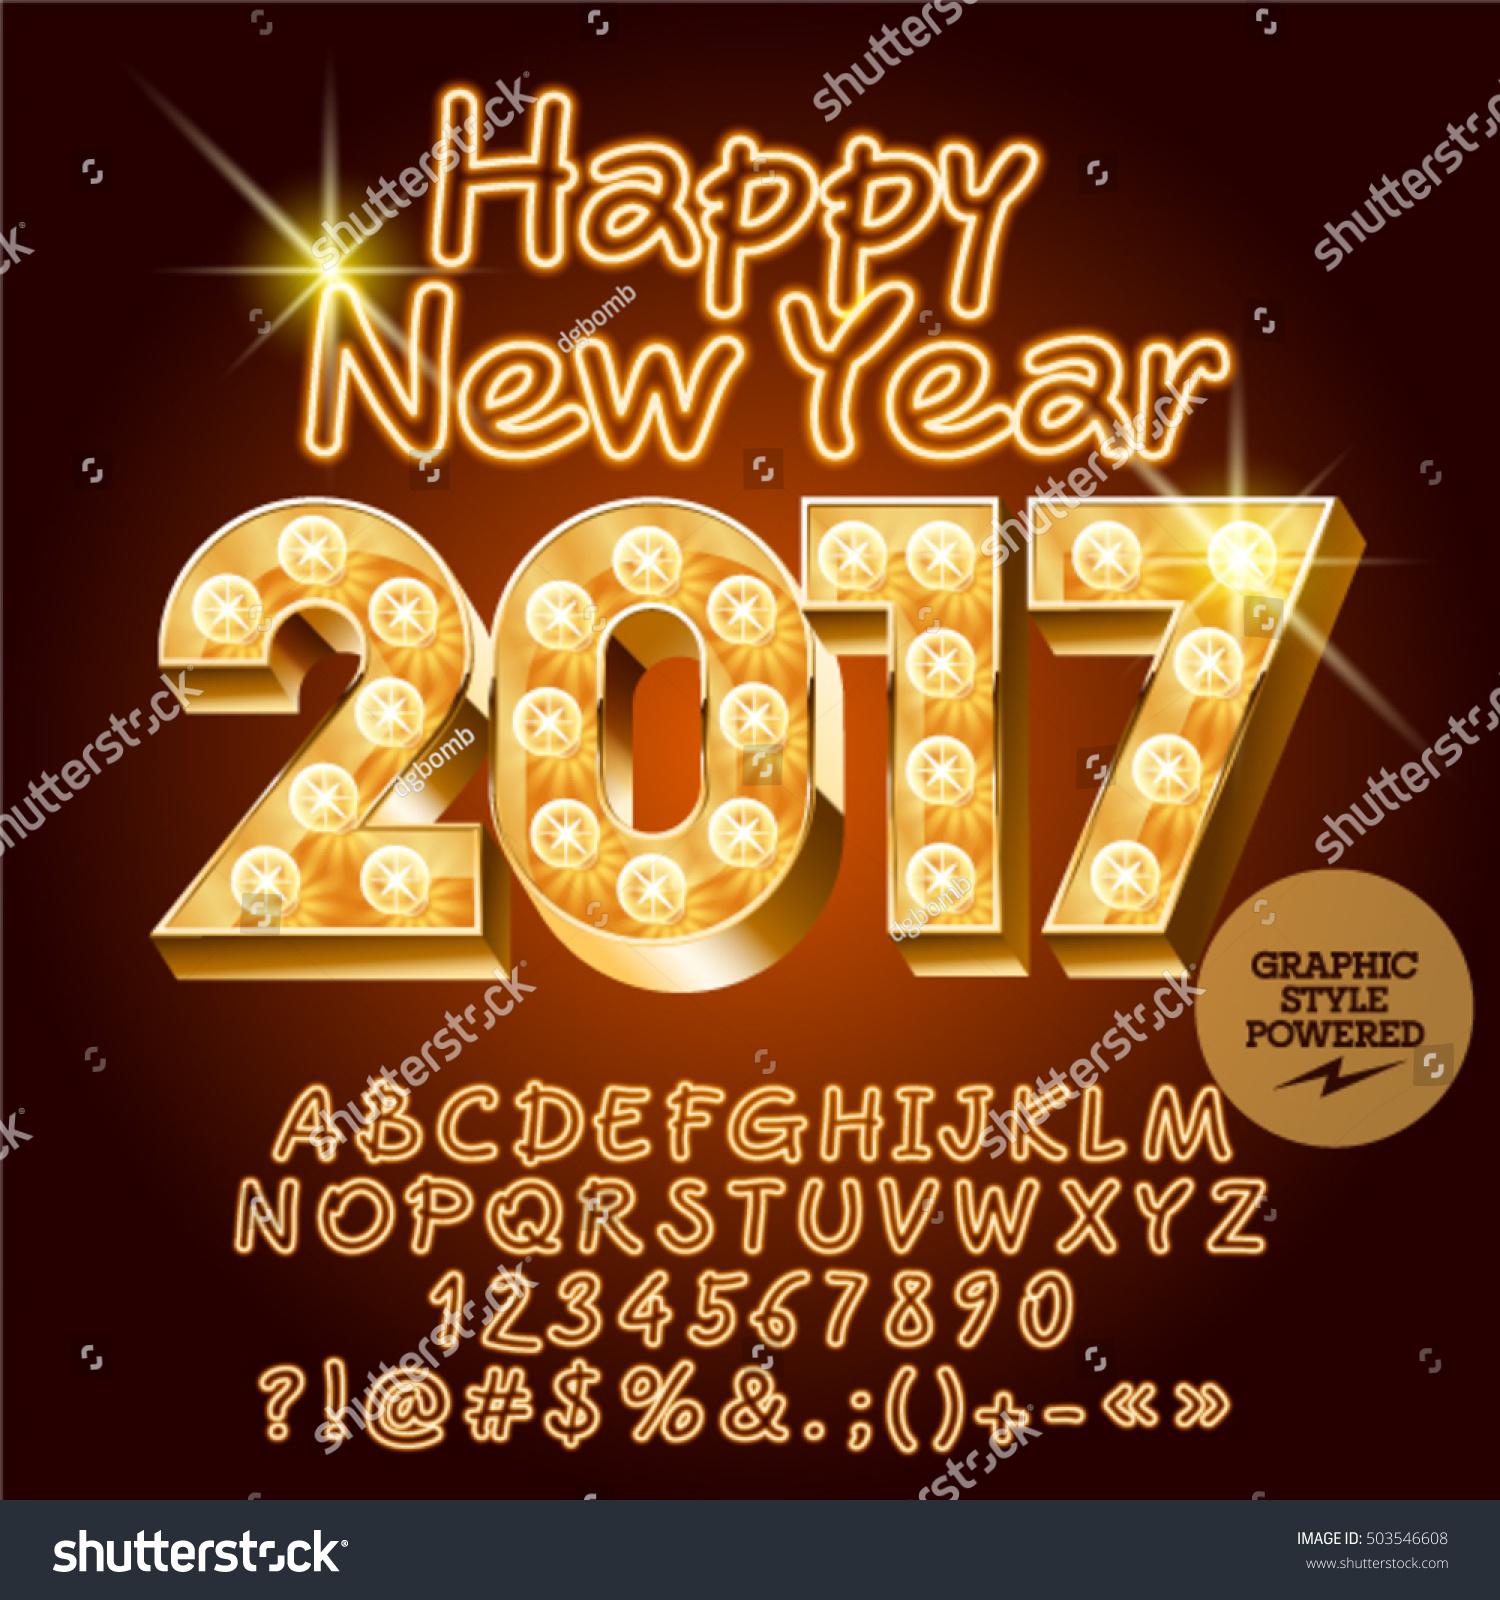 Vector Light Happy New Year 2017 Stock Vector 503546608